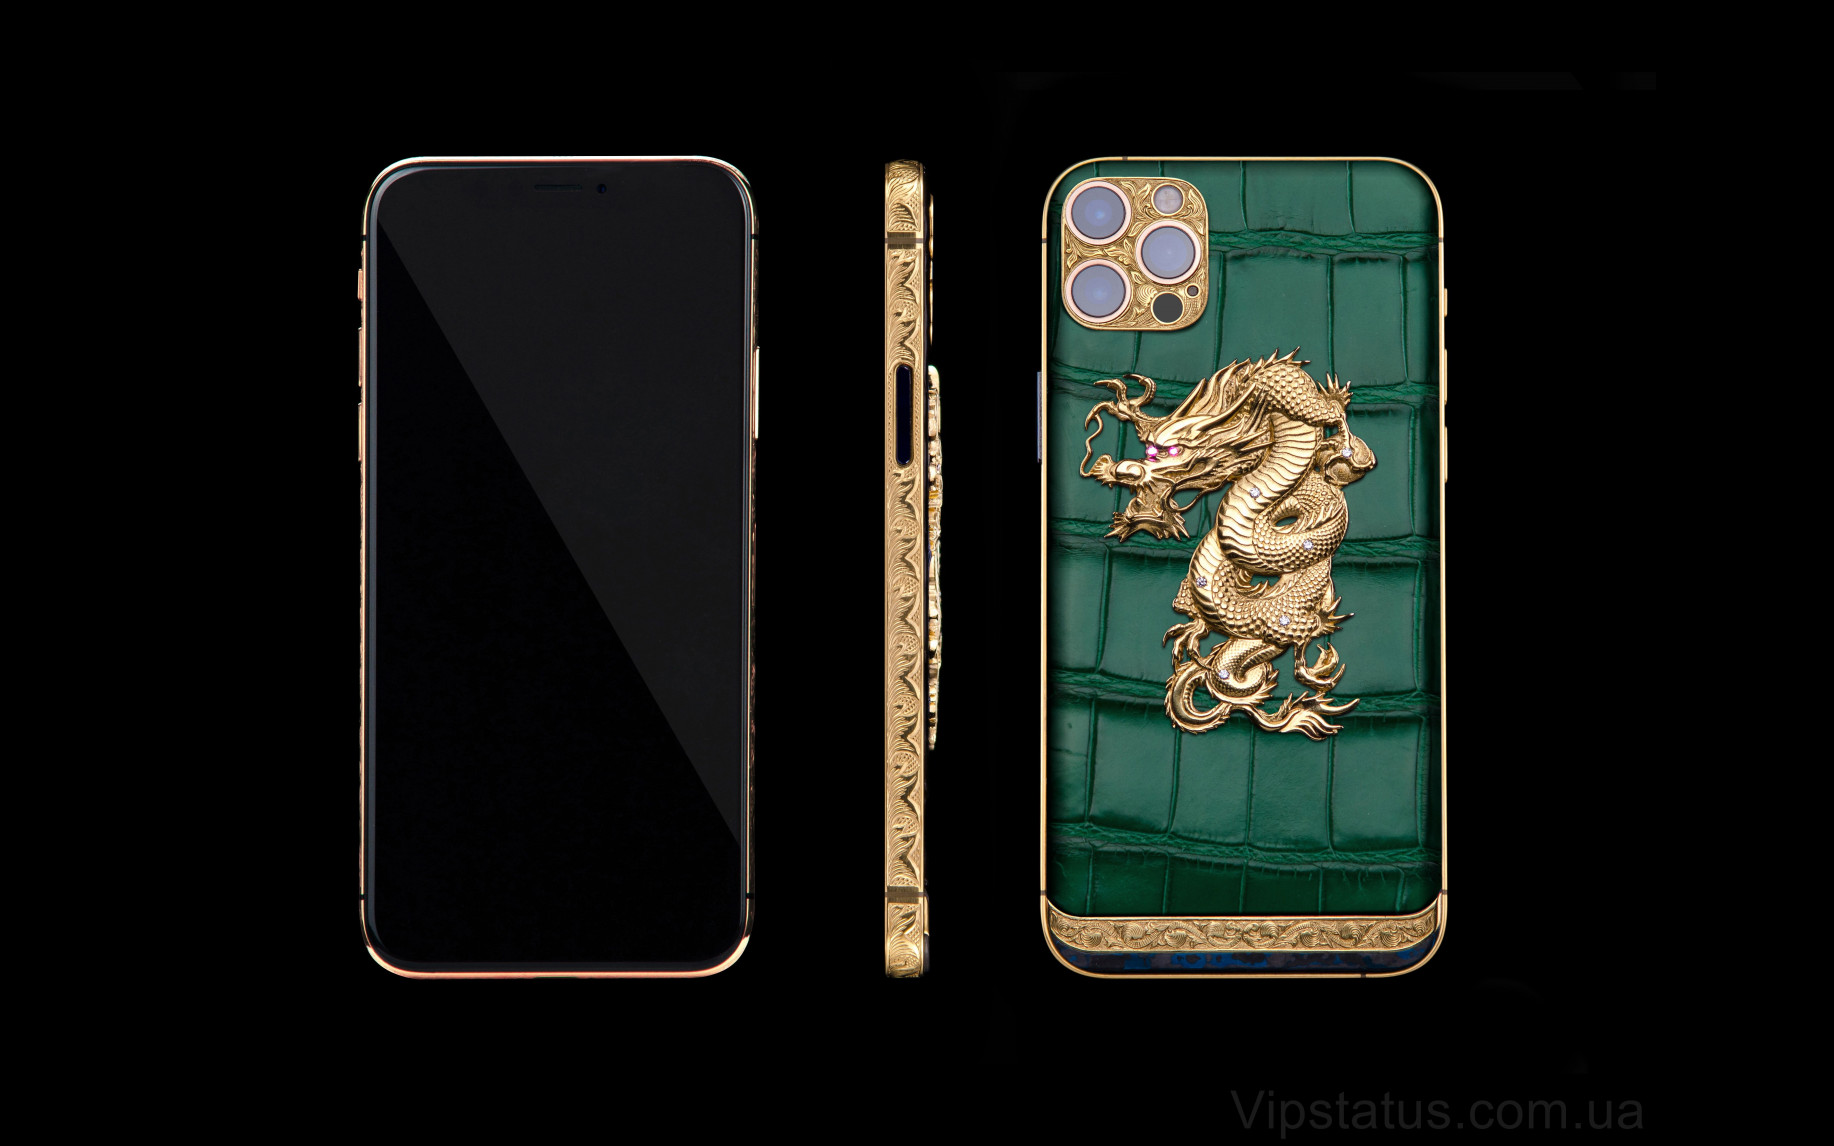 Elite Oriental Dragon IPHONE 12 PRO MAX 512 GB Oriental Dragon IPHONE 12 PRO MAX 512 GB image 26